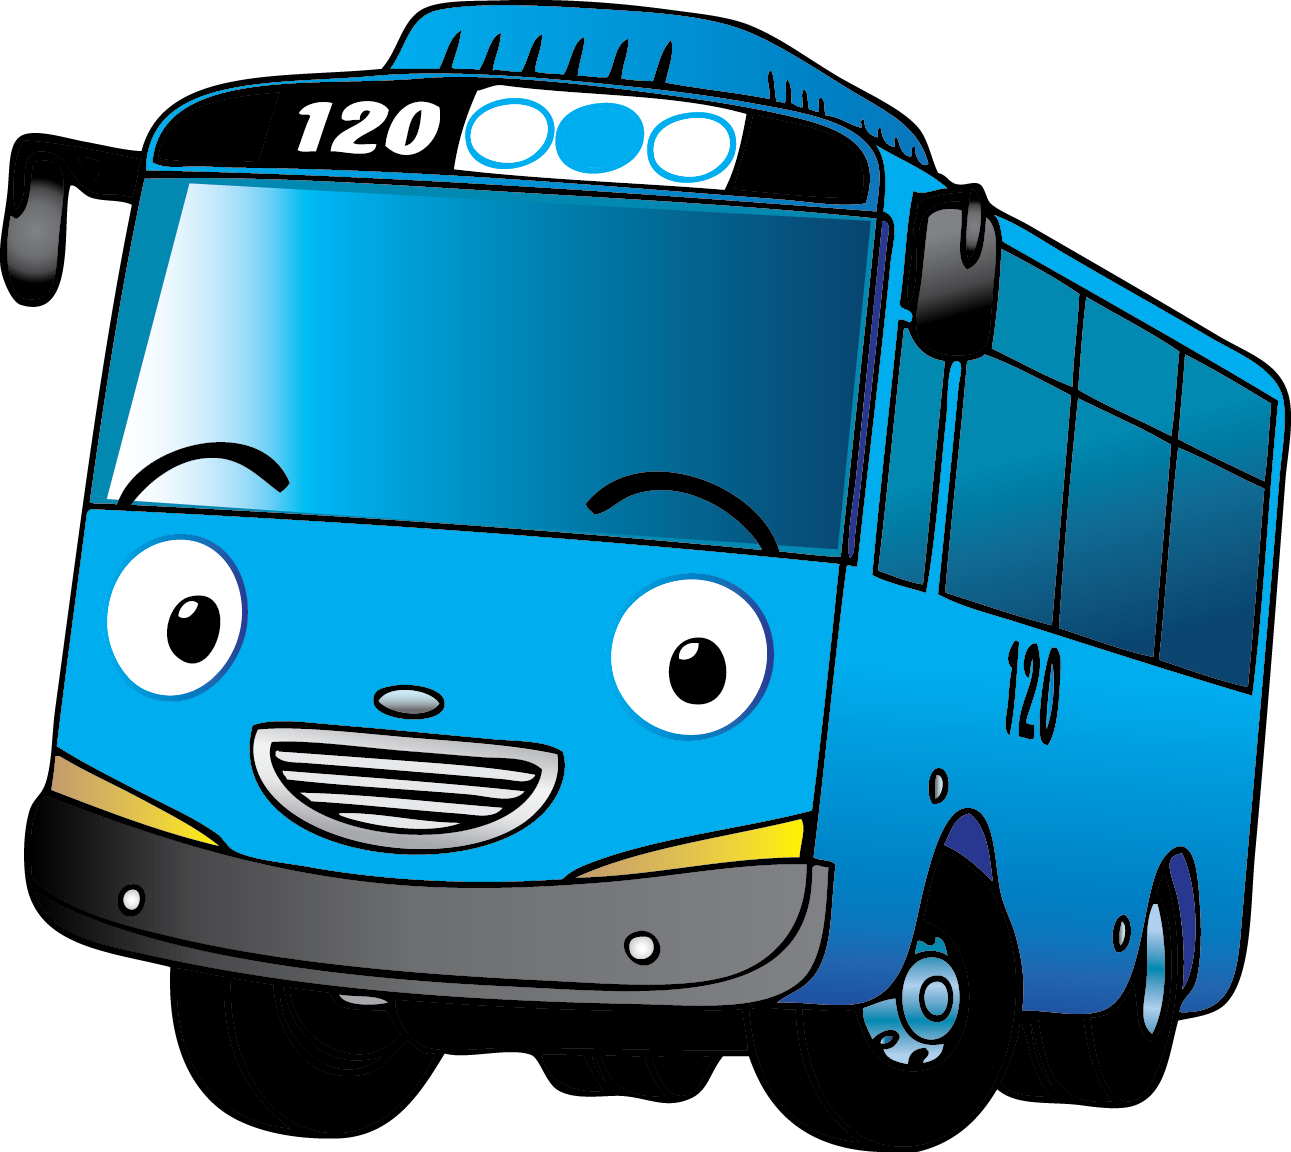 Sinij Avtobus Kartun Mobil Lucu